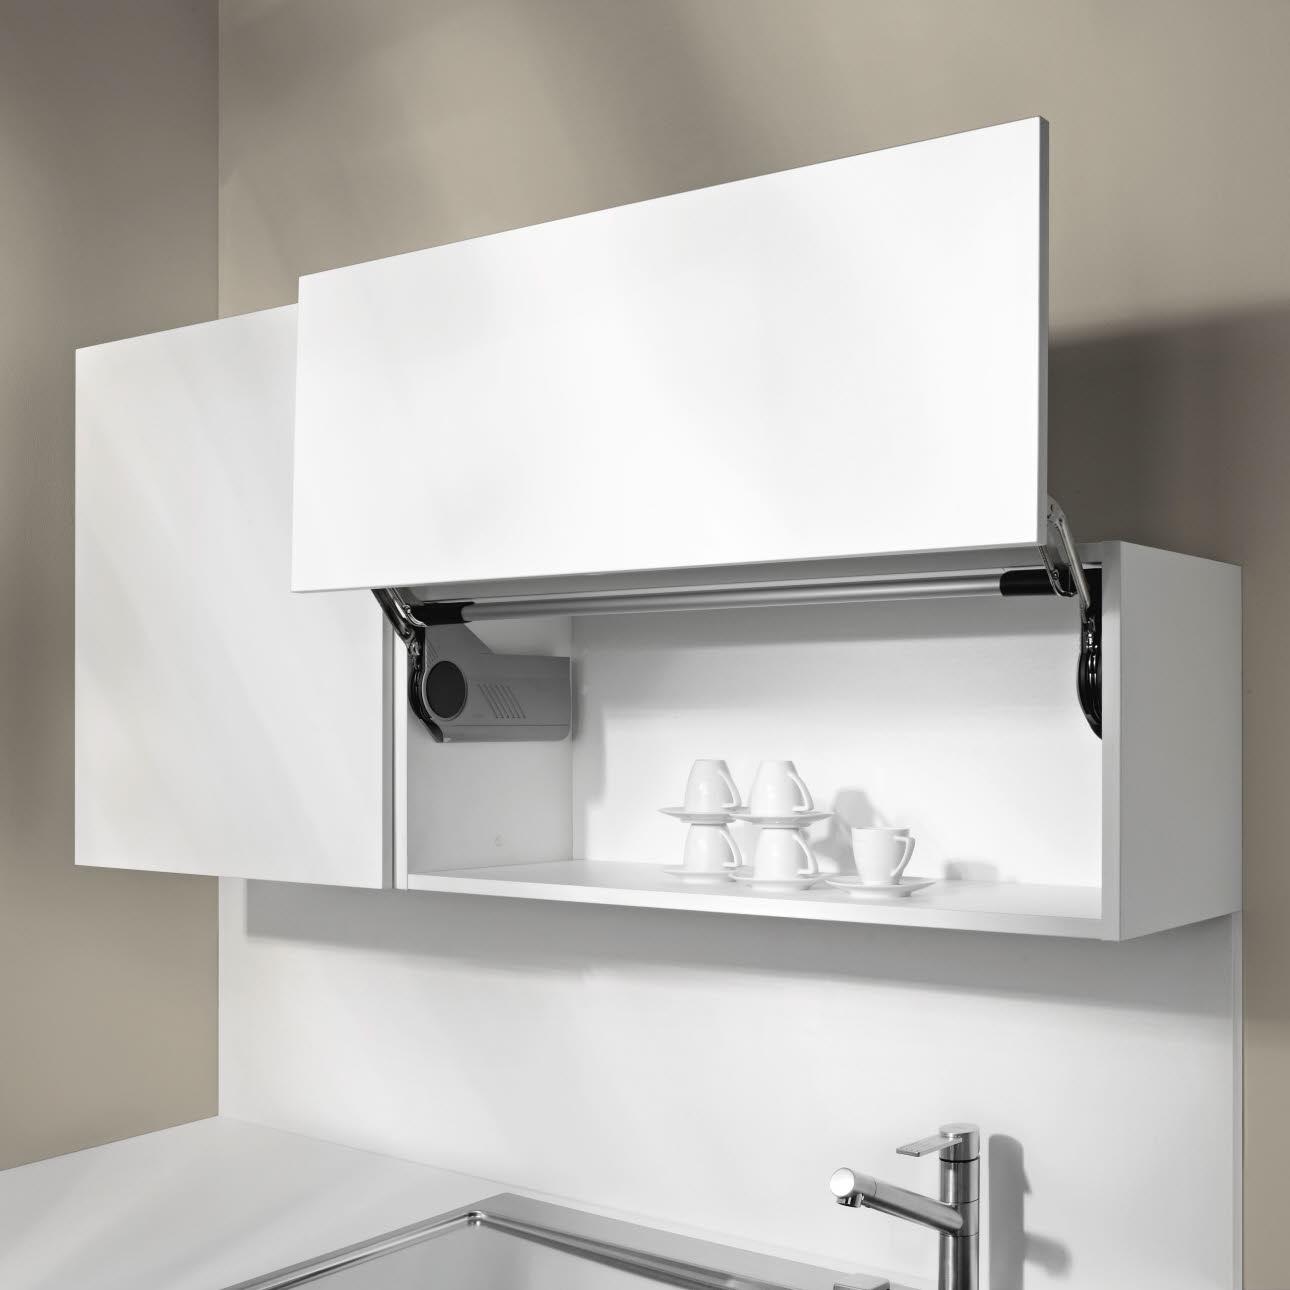 Elegant Oberschrank Mit Lifttürbeschlag